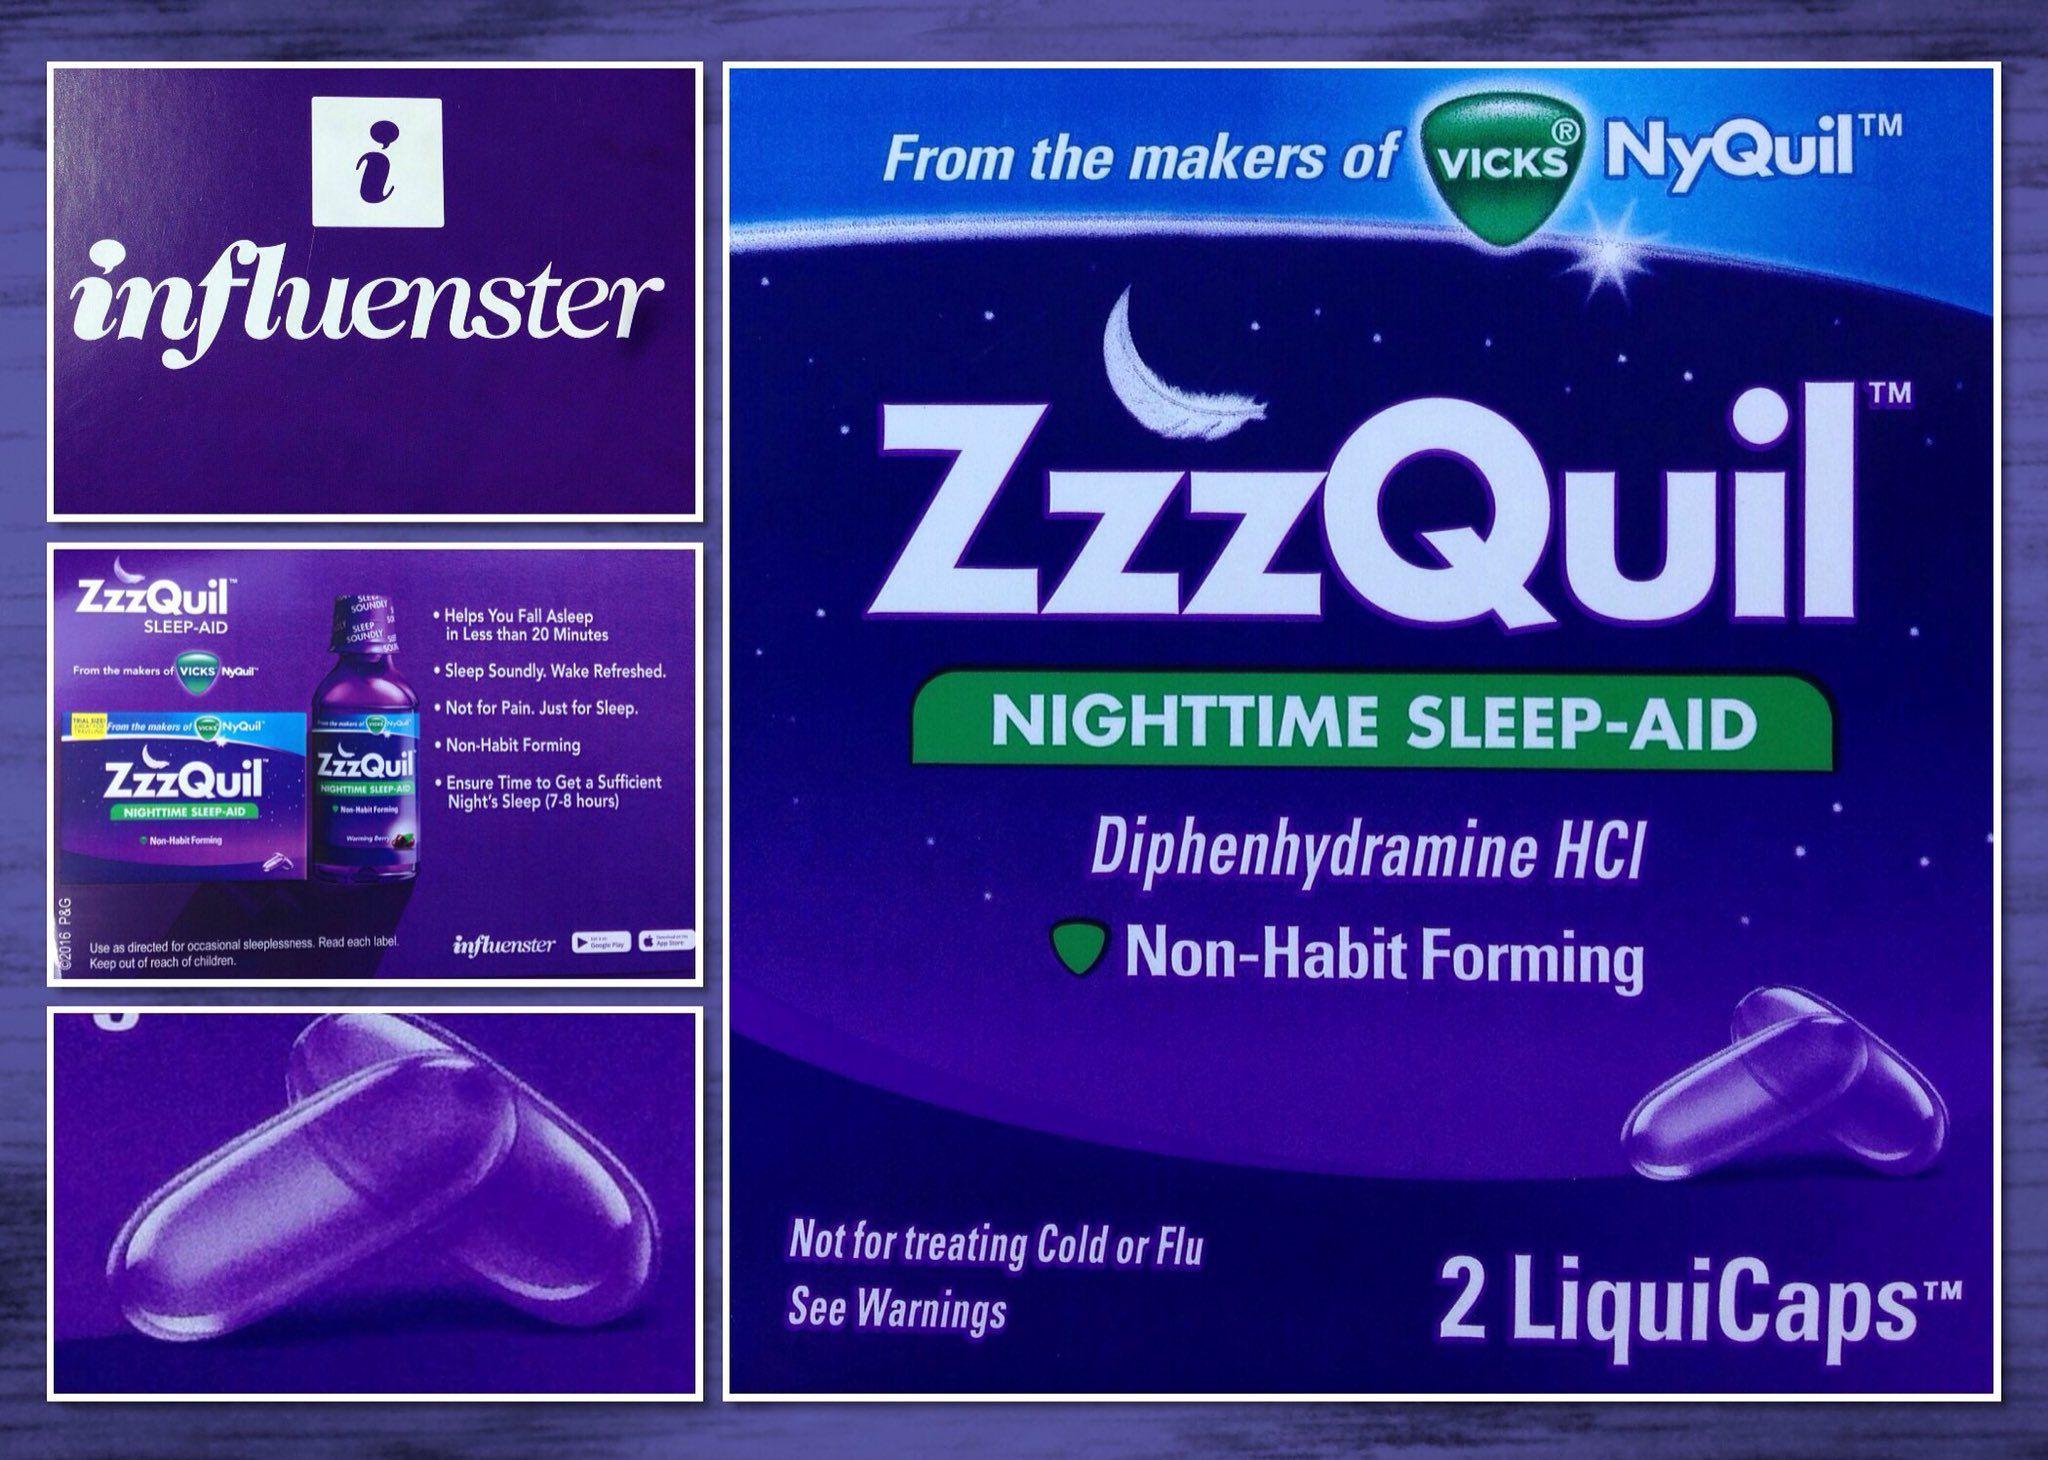 Missyanne On Twitter Nighttime Sleep Aid Habit Forming Sleep Lover